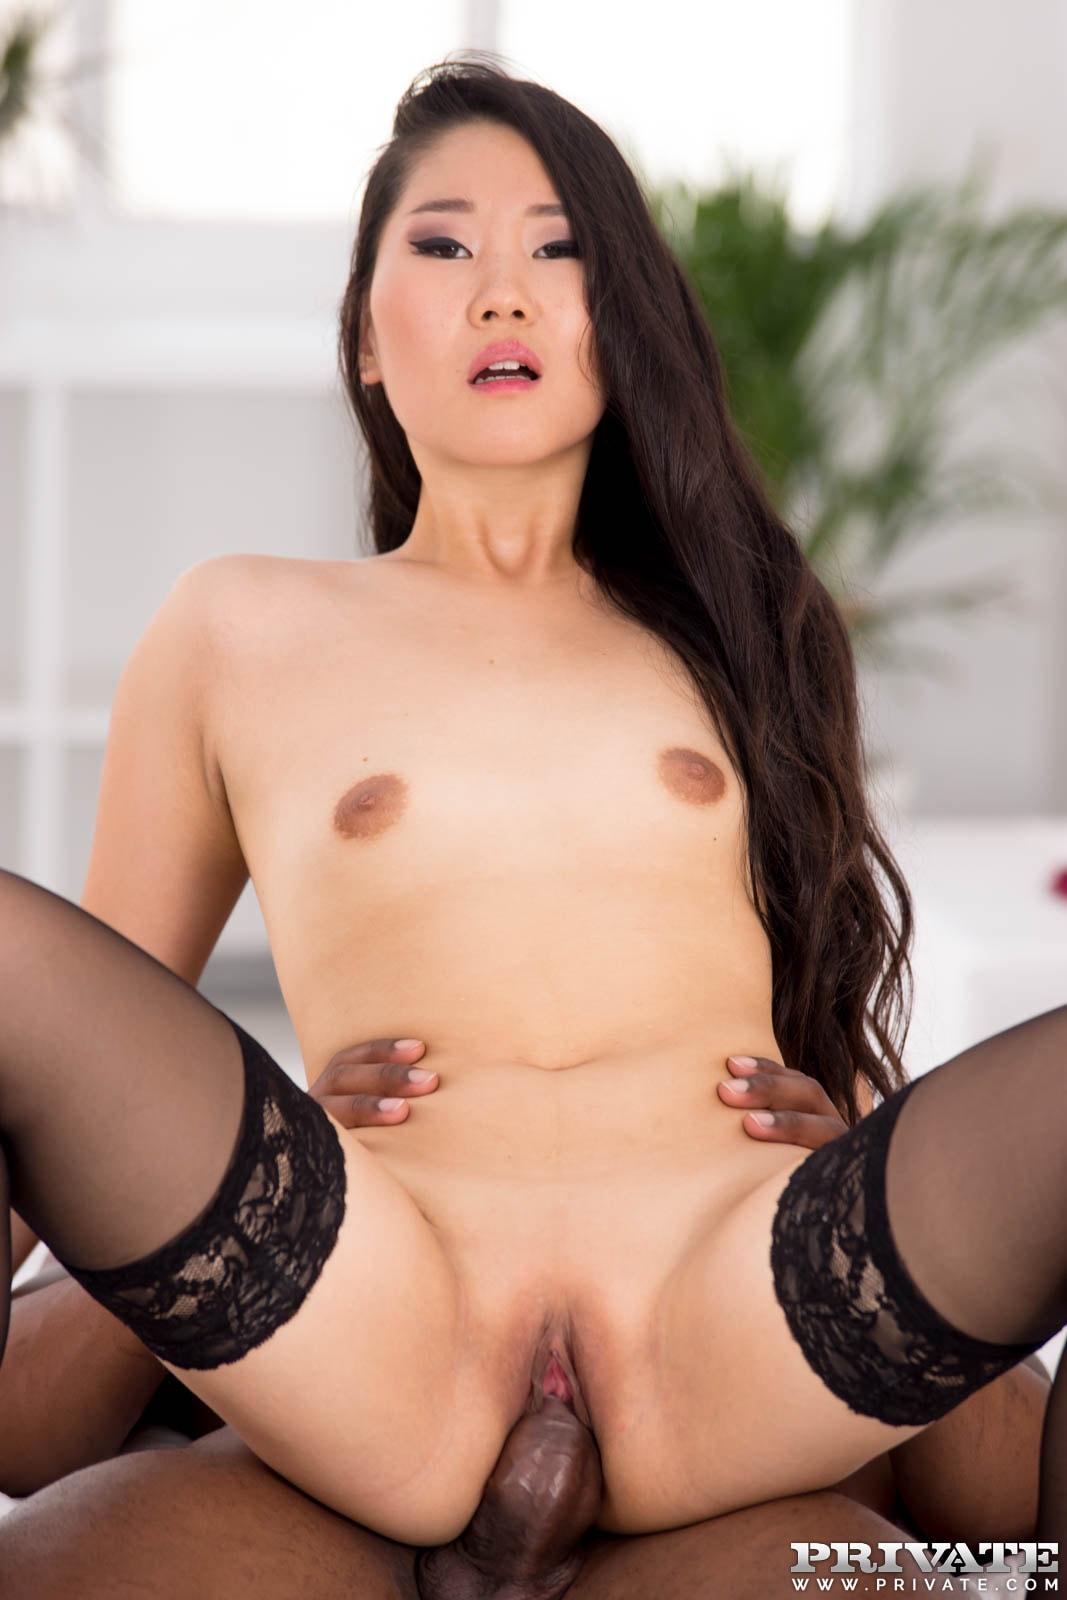 Asian Interracial Porn Sites